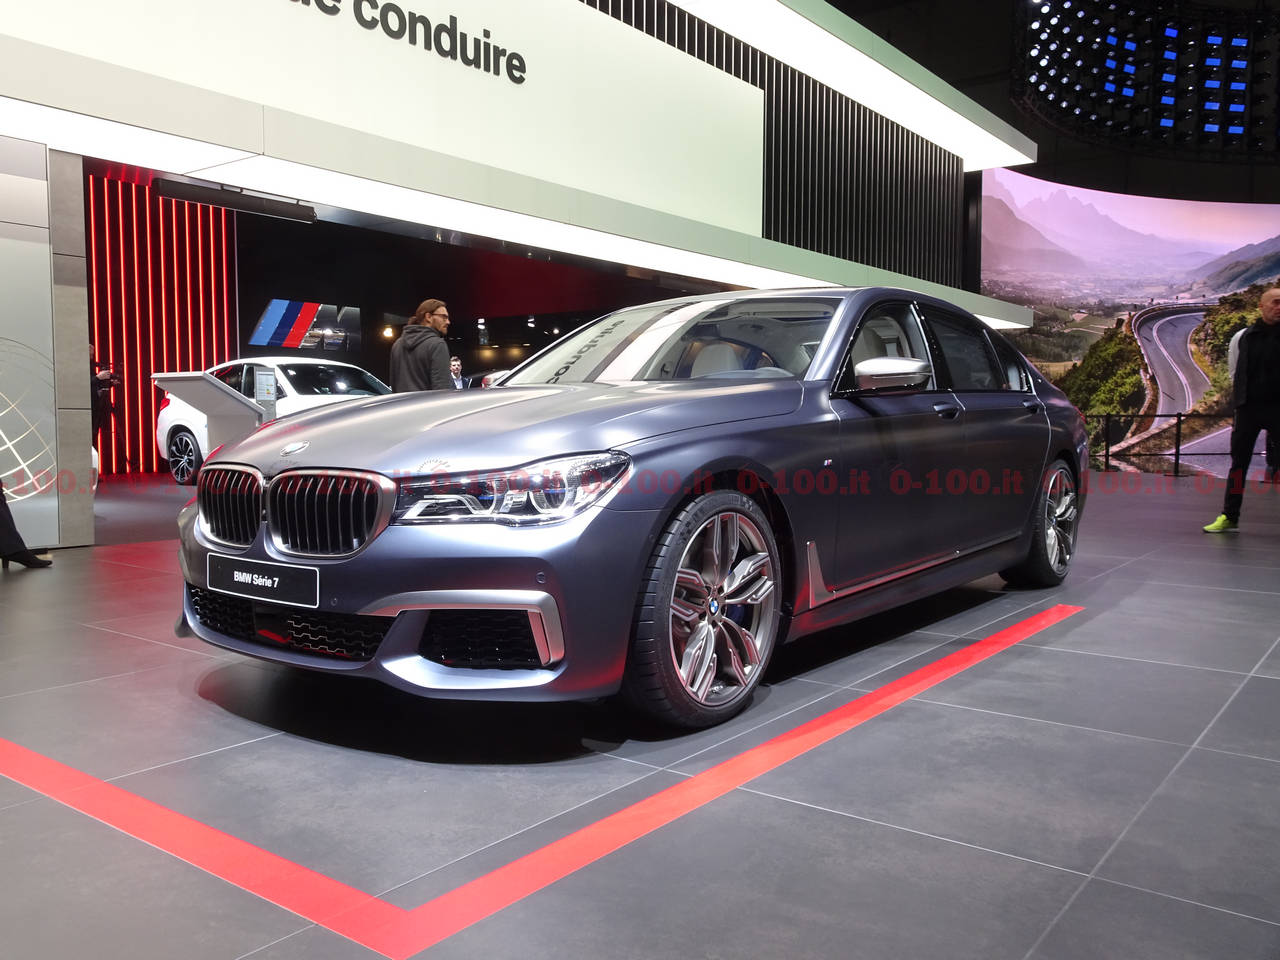 Ginevra-geneva-geneve-2017-BMW_Serie-7_0-100_9